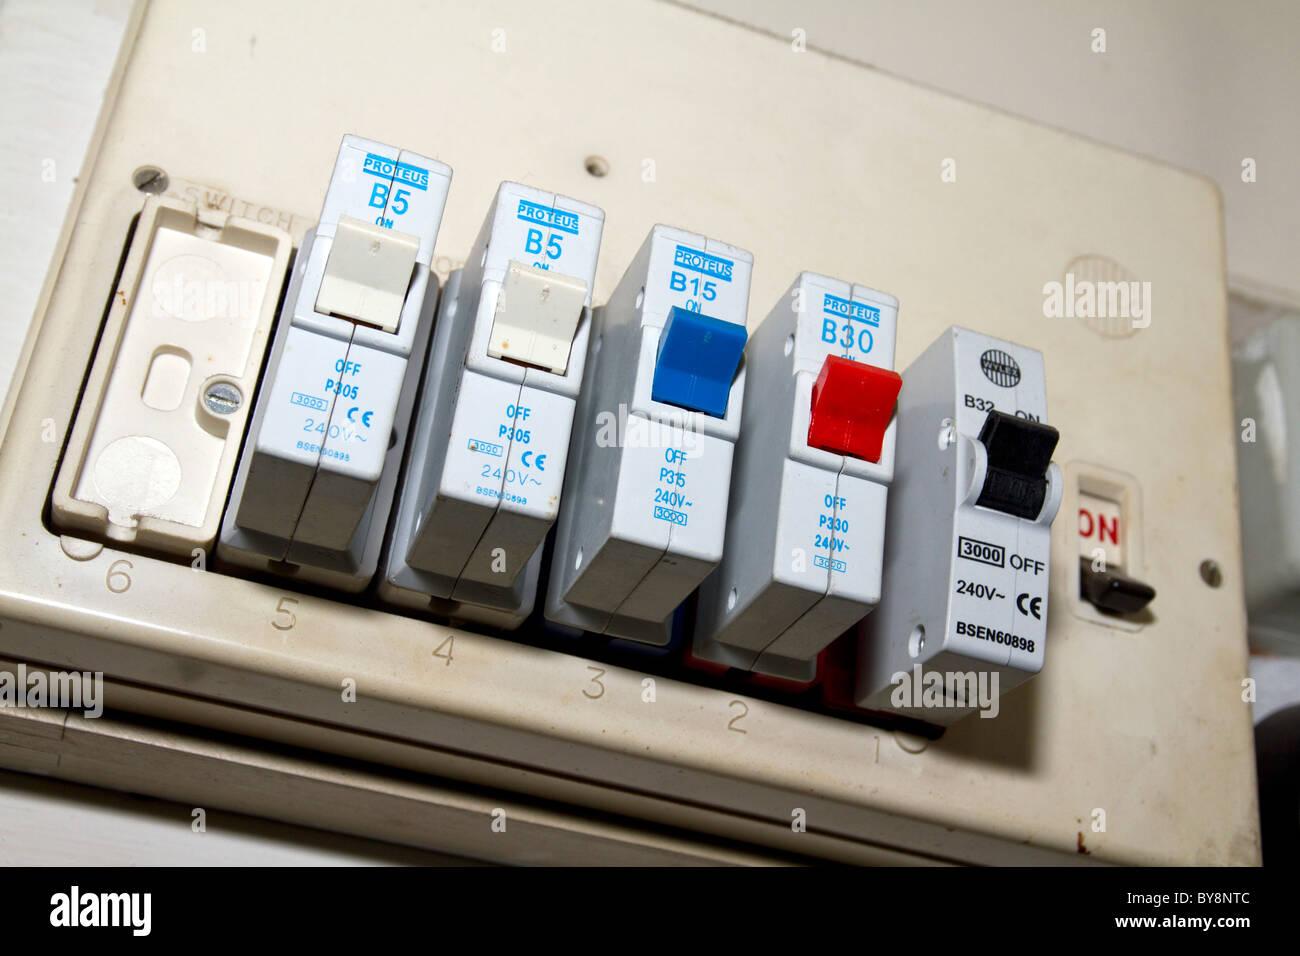 Wylex Fuse Box Colours Rcd Wiring Diagram Auto Electrical Rh Advantageweb Me Buss Marine Circuit Breakers Consumer Unit